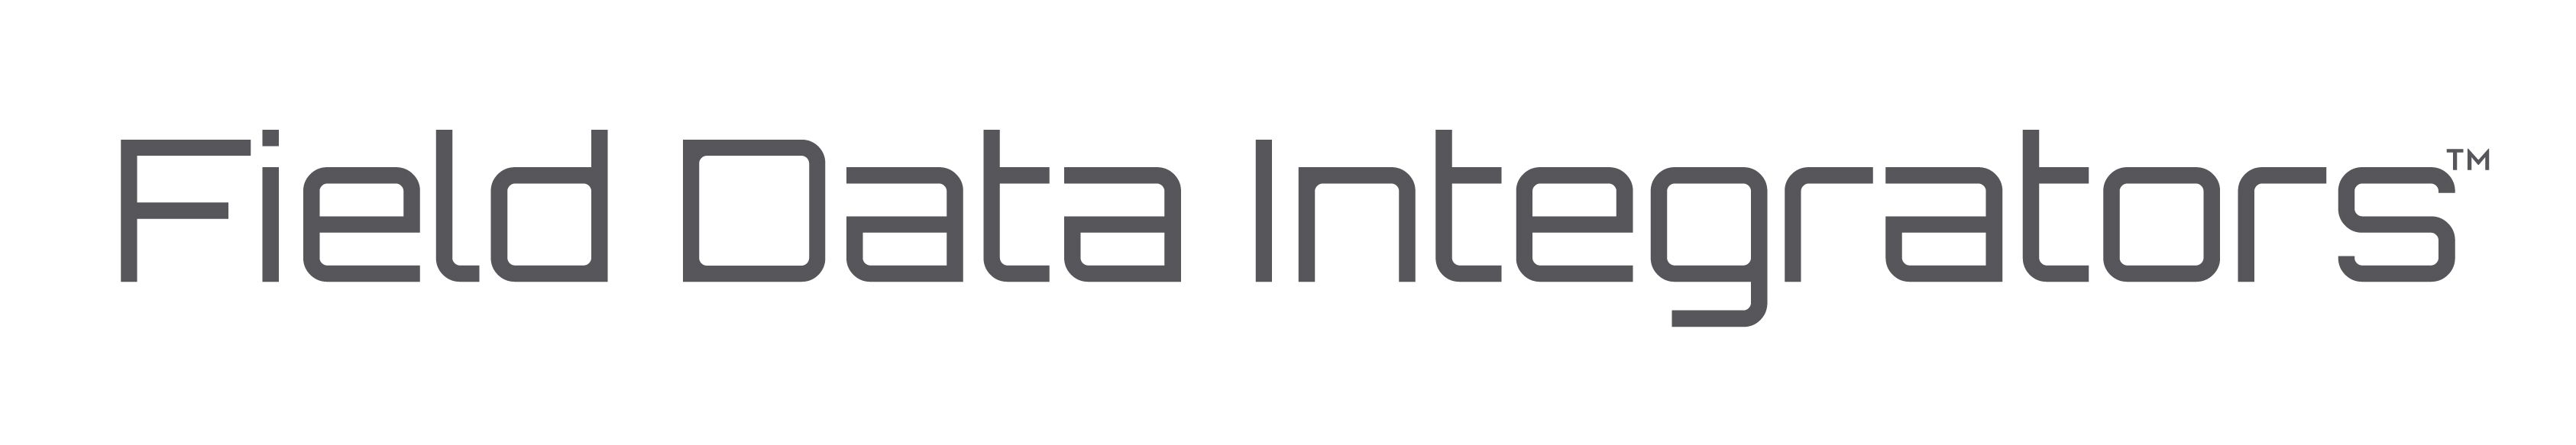 Field Data Integrators (FDI) Announces Partnership with ServiceMax to Further Streamline Asset Management